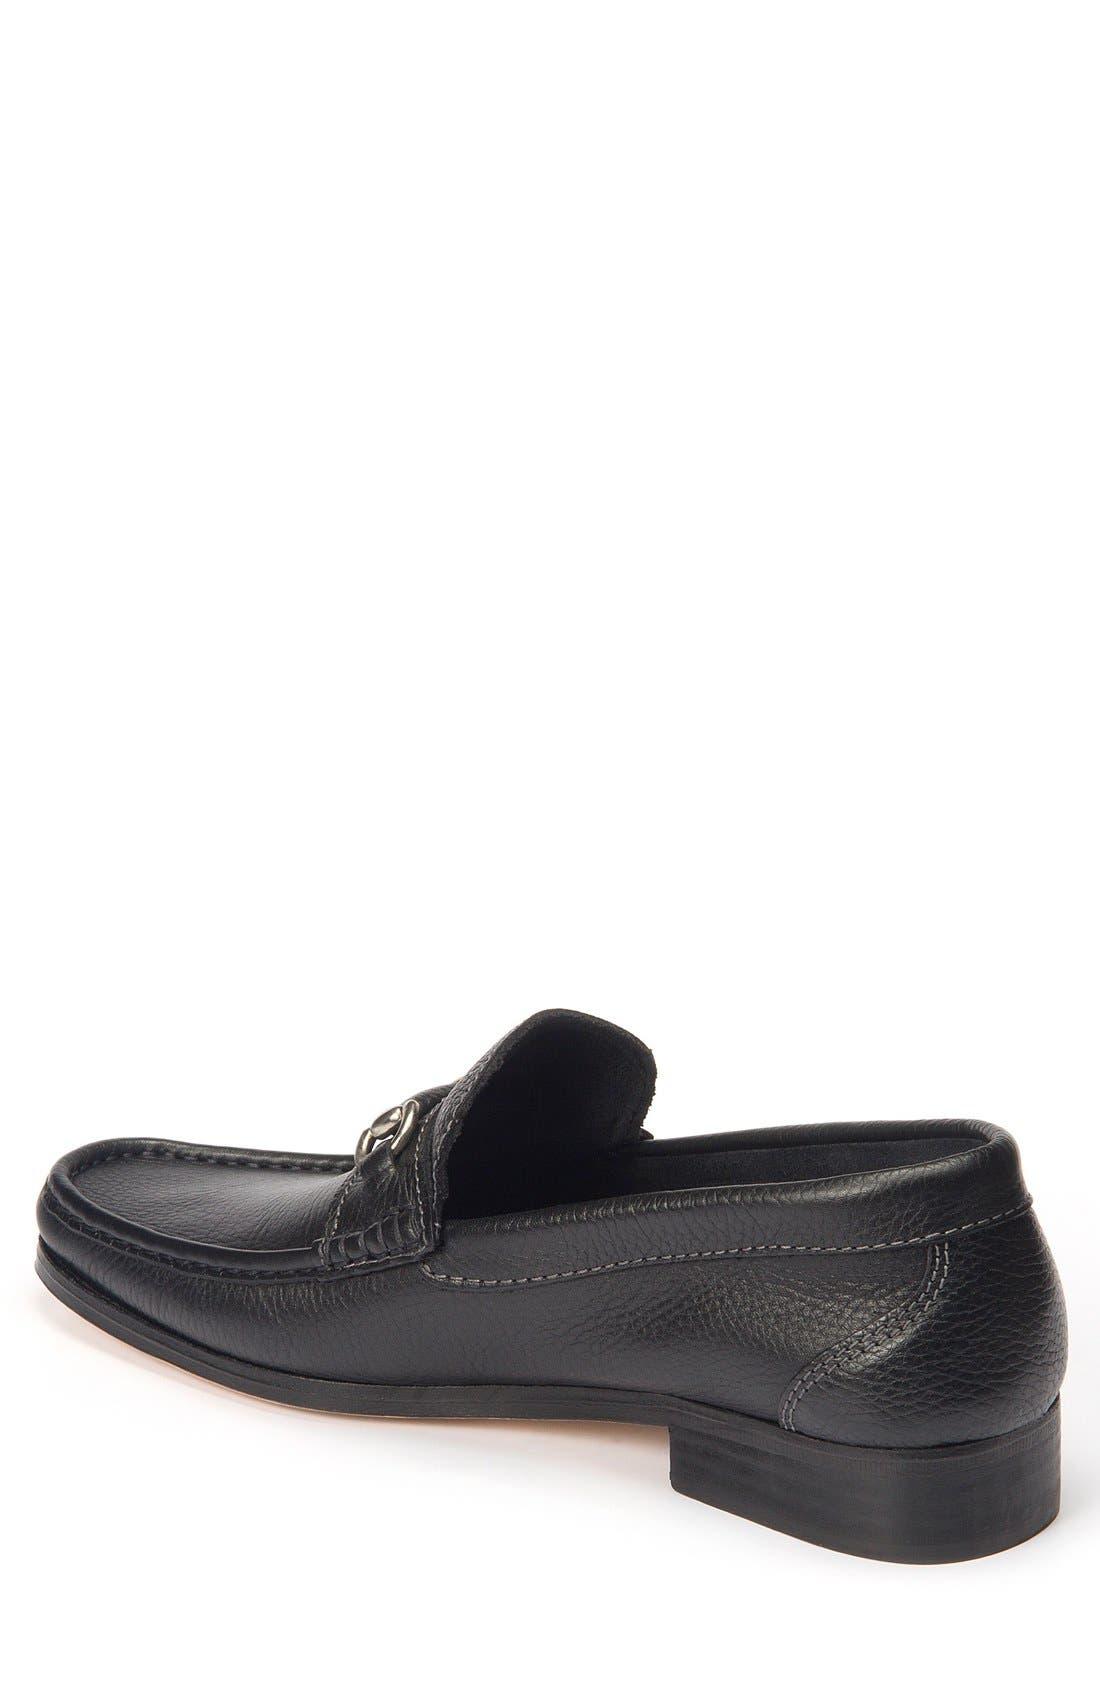 Garda Bit Loafer,                             Alternate thumbnail 2, color,                             Black Leather